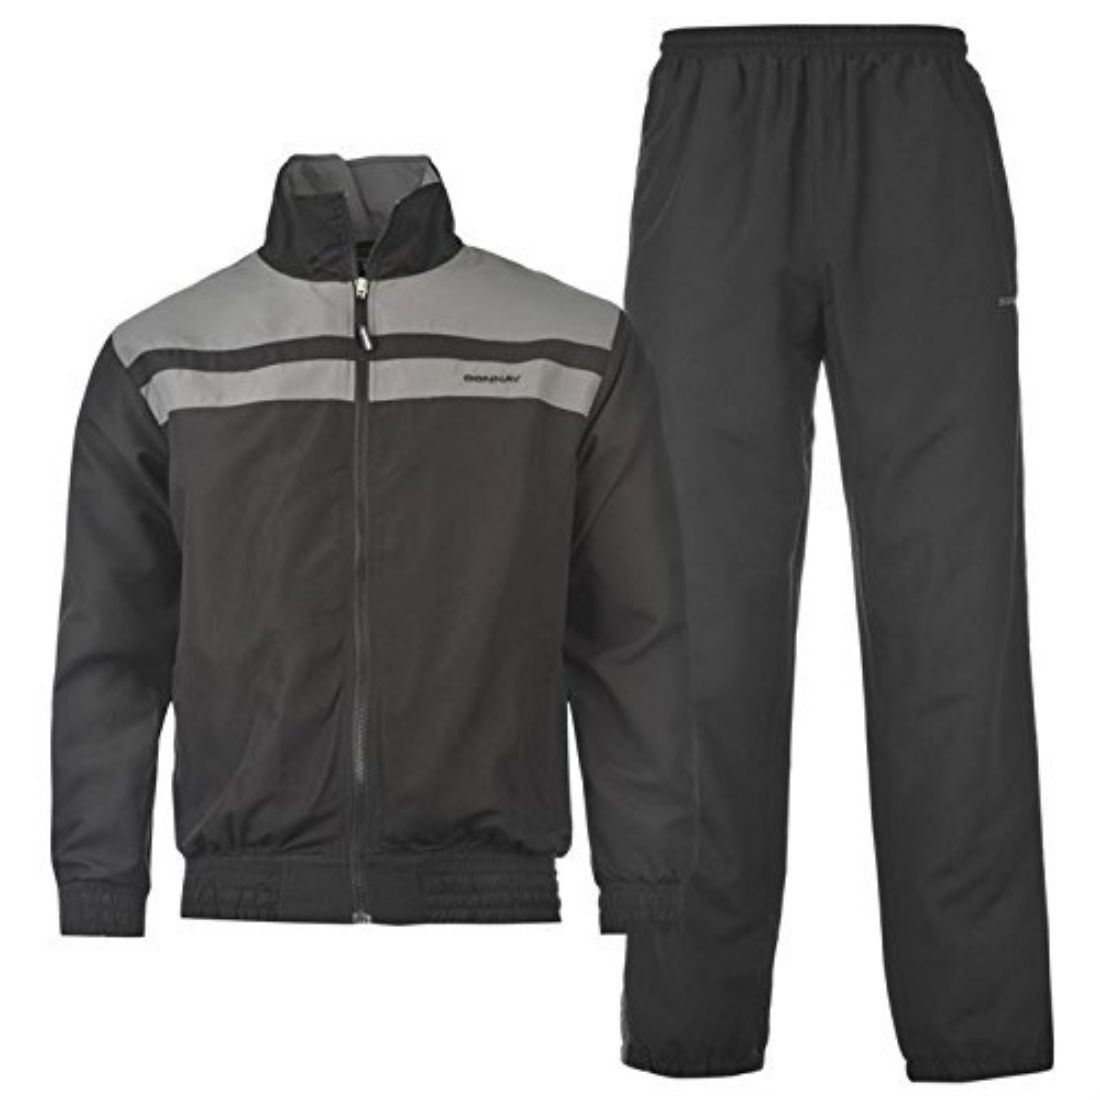 Donnay Mens Wvn Tracksuit Sport Training Full Zip Long Sleeves Activewear